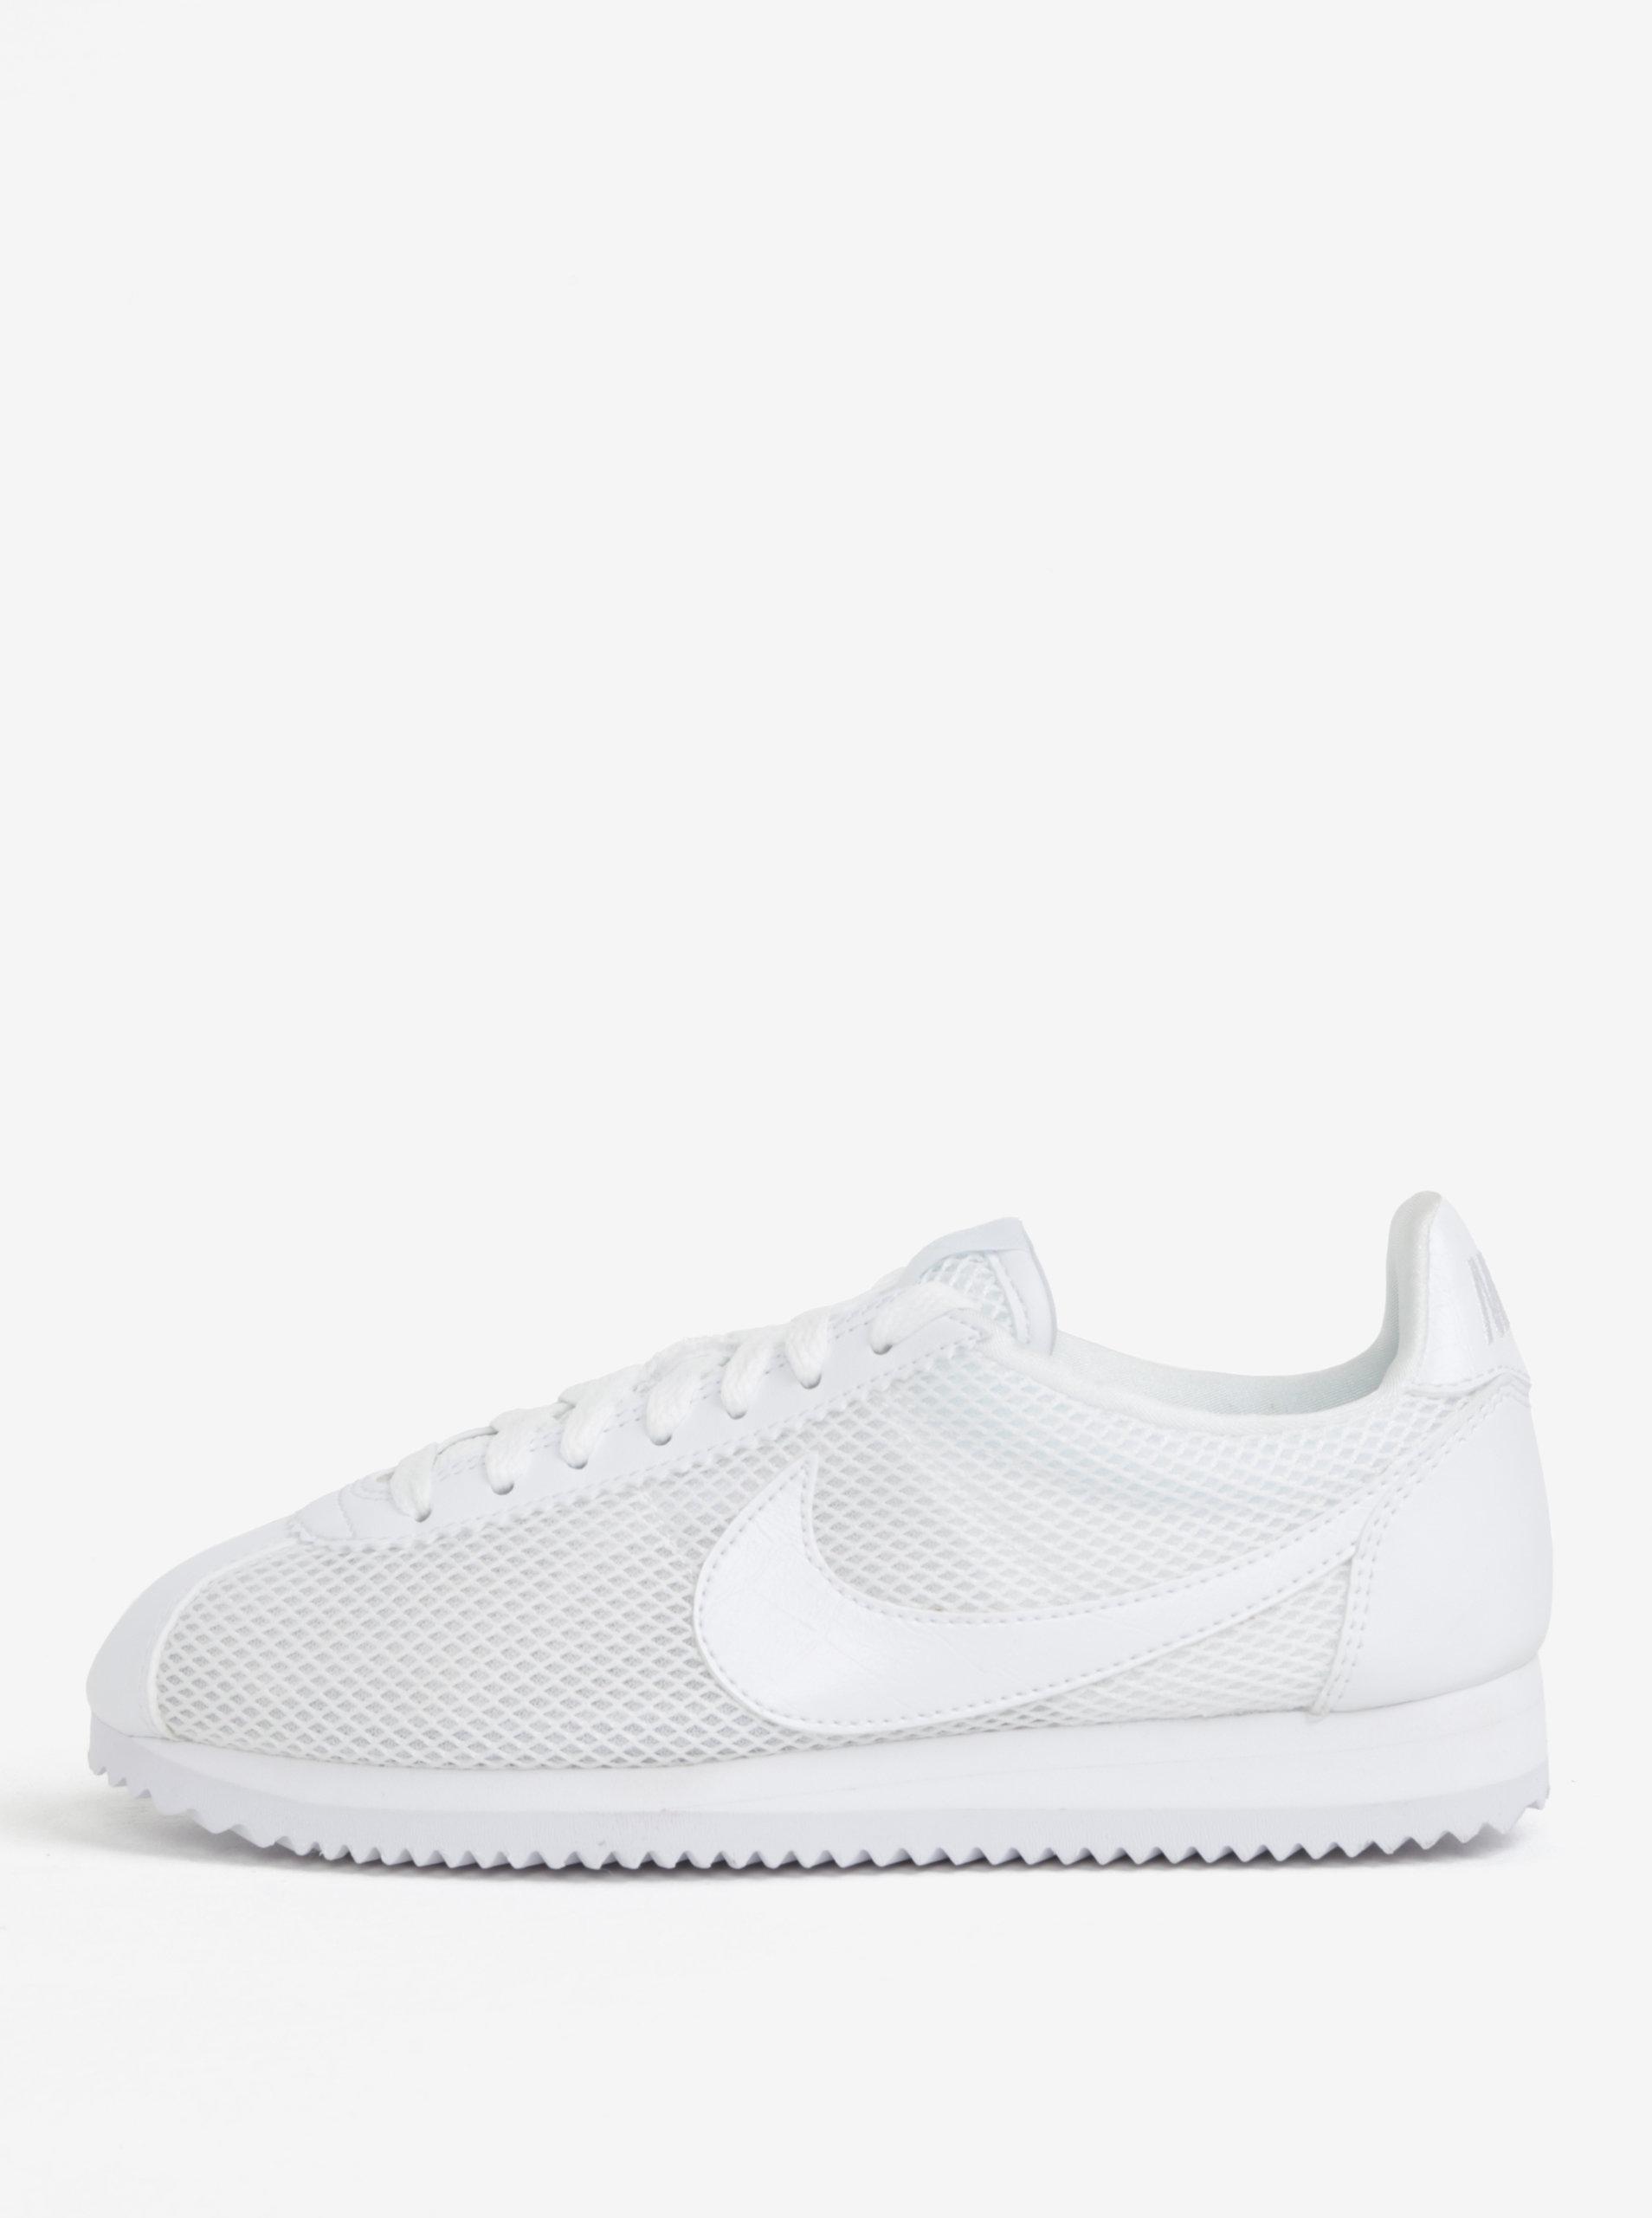 Bílé dámské tenisky Nike Classic Cortez ... 0934798e6bc